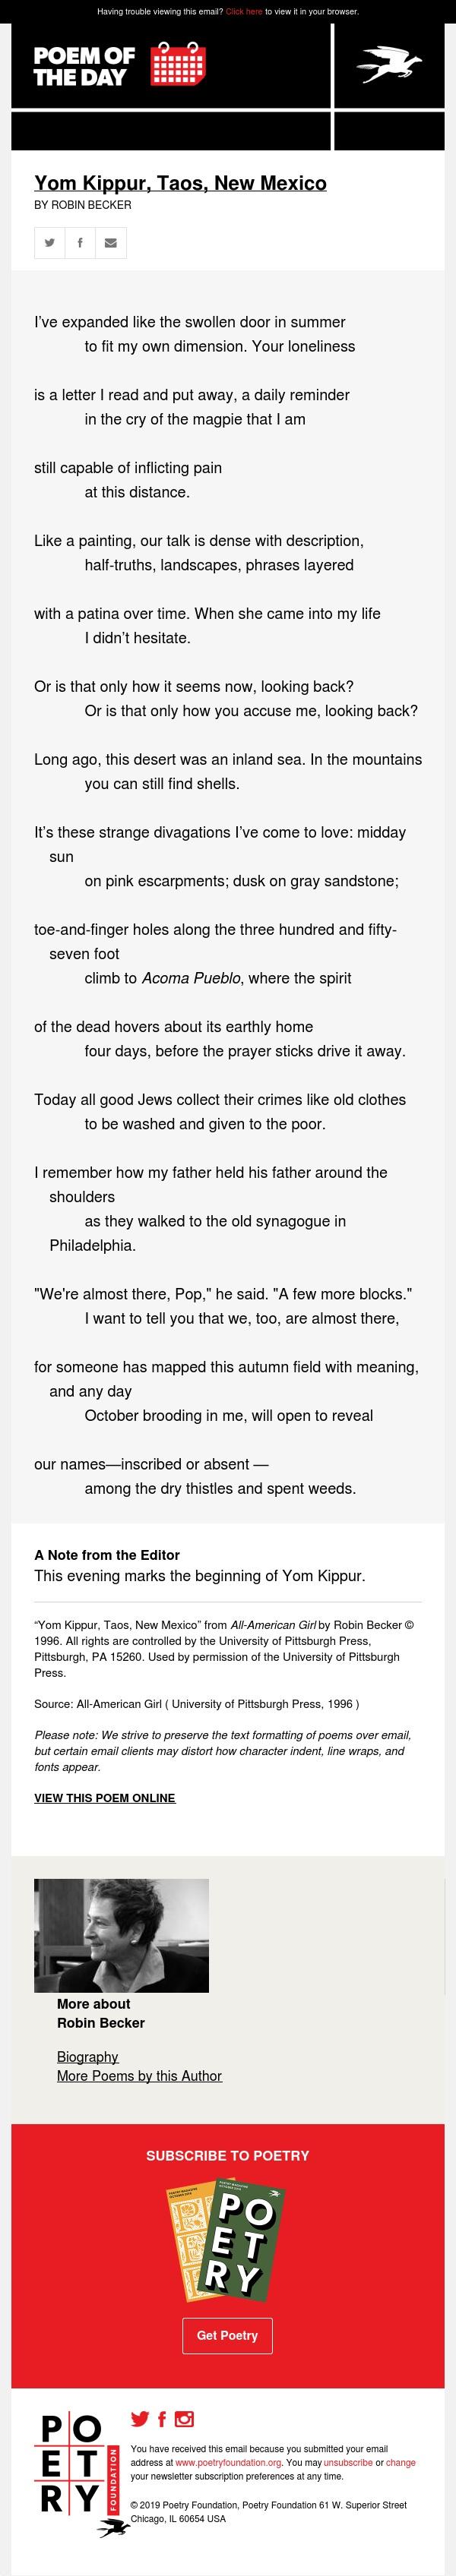 Poem of the Day: Yom Kippur, Taos, New Mexico